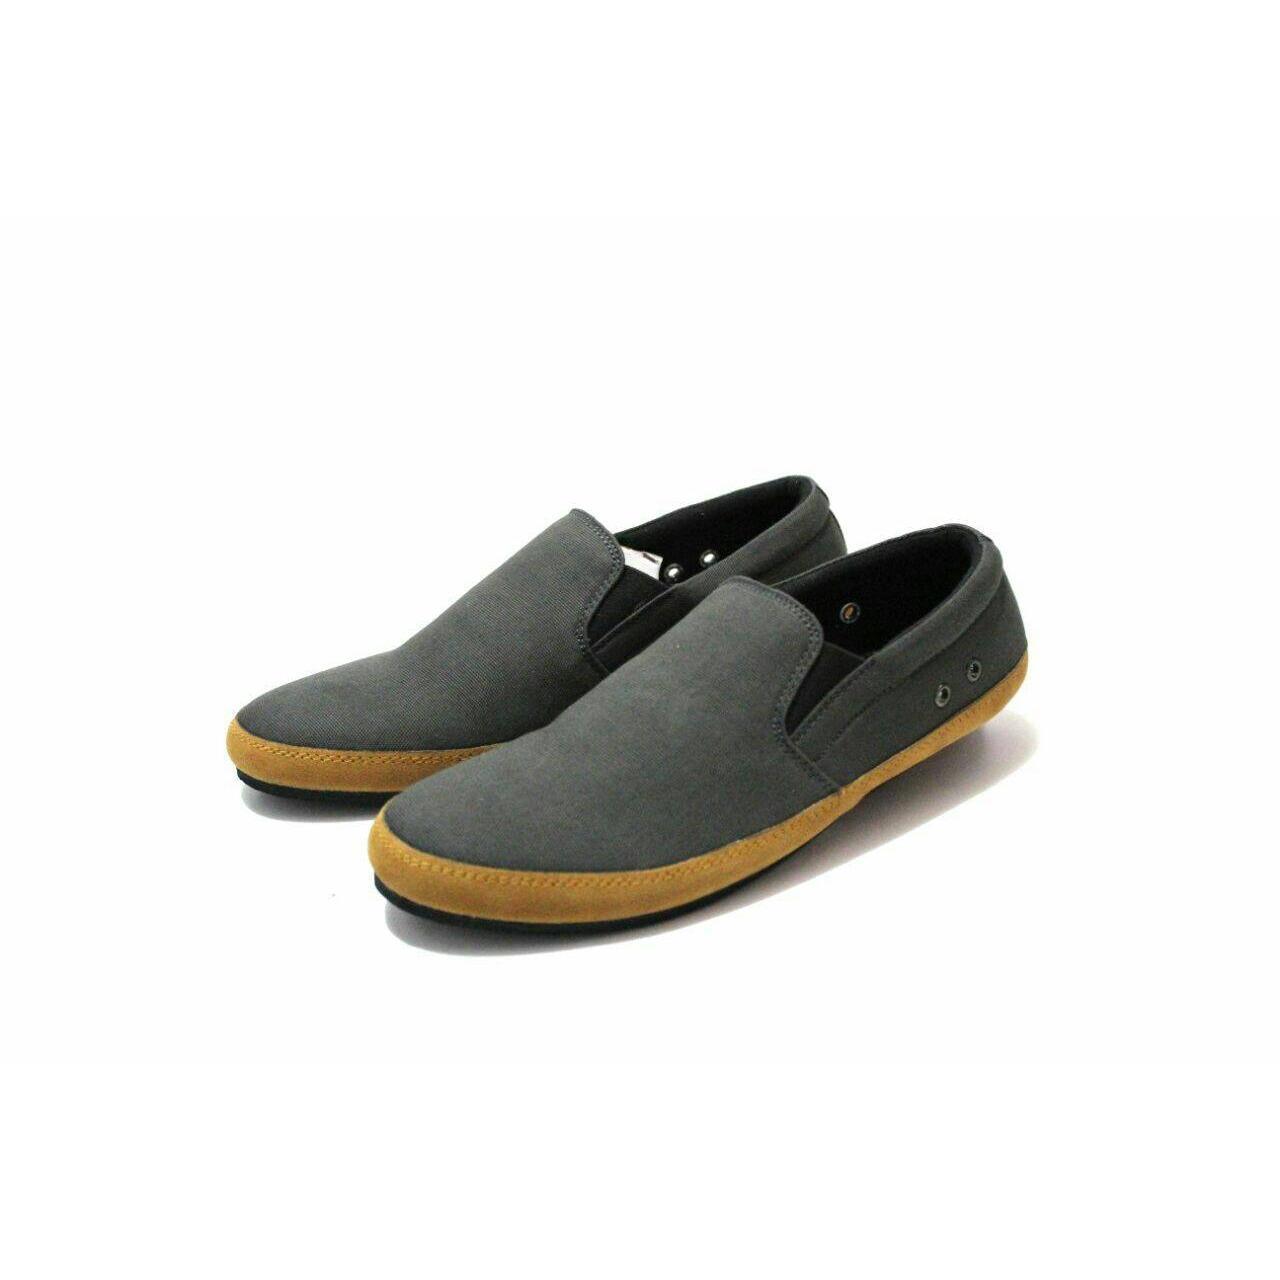 Louis Visto sepatu pria formal kulit asli model LV 206 Black. Source .